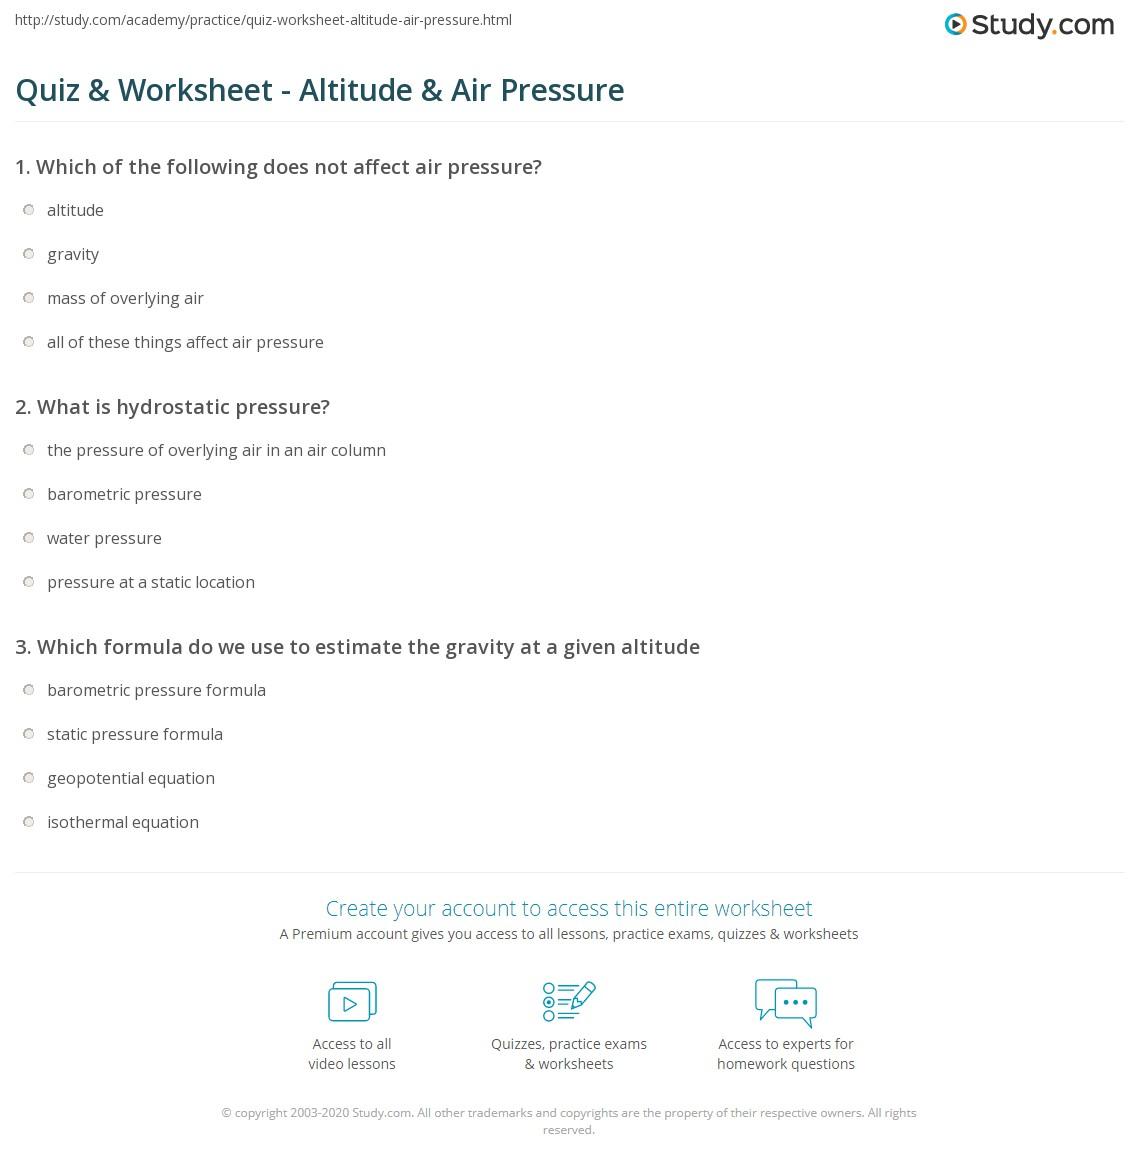 Quiz & Worksheet - Altitude & Air Pressure | Study.com